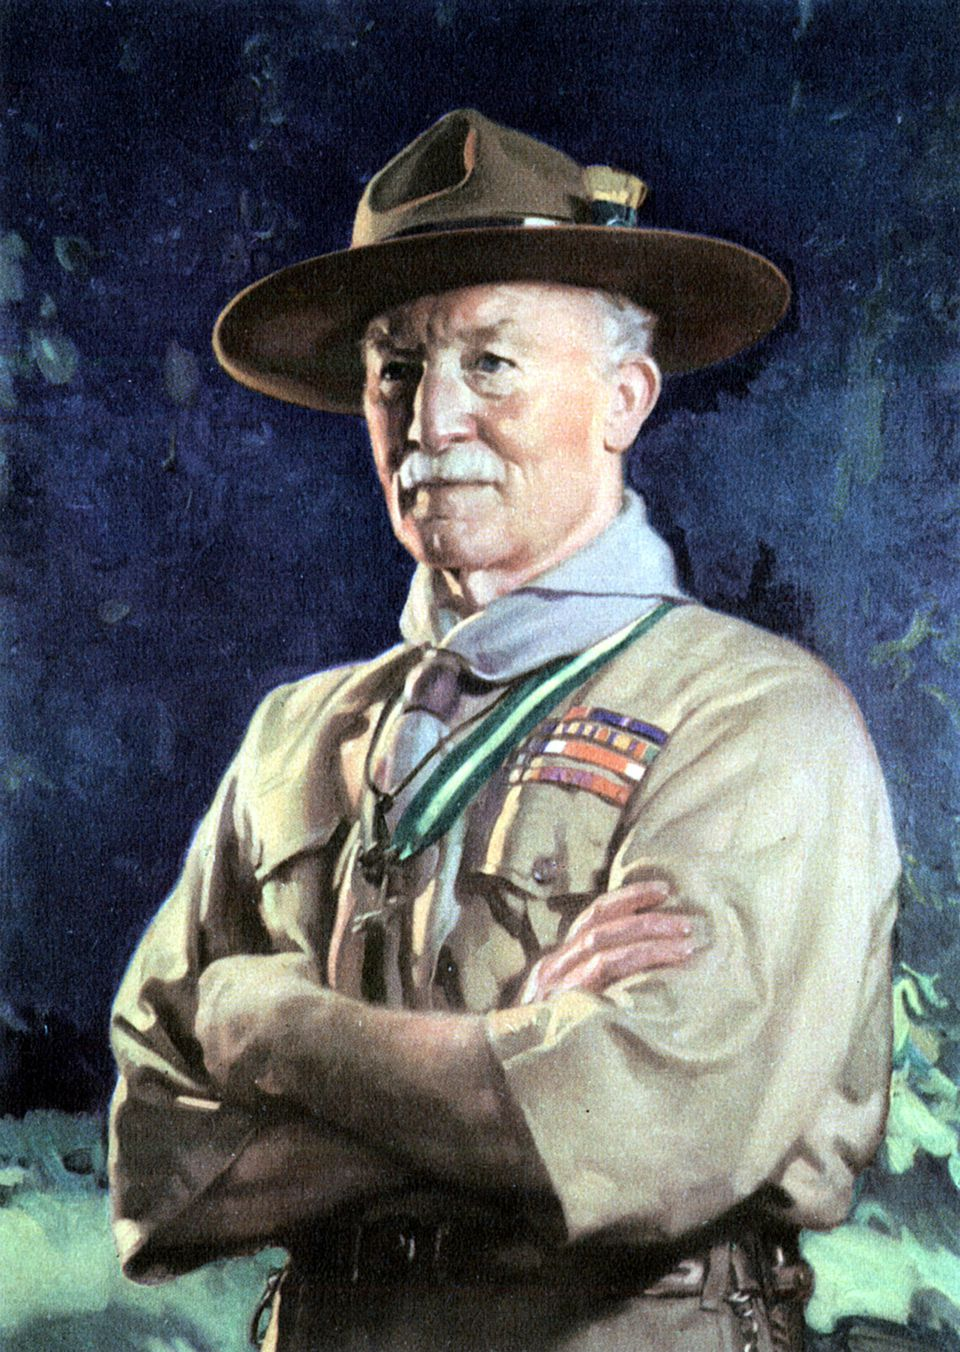 Lieutenant General Robert Stephenson Smyth Baden-Powell